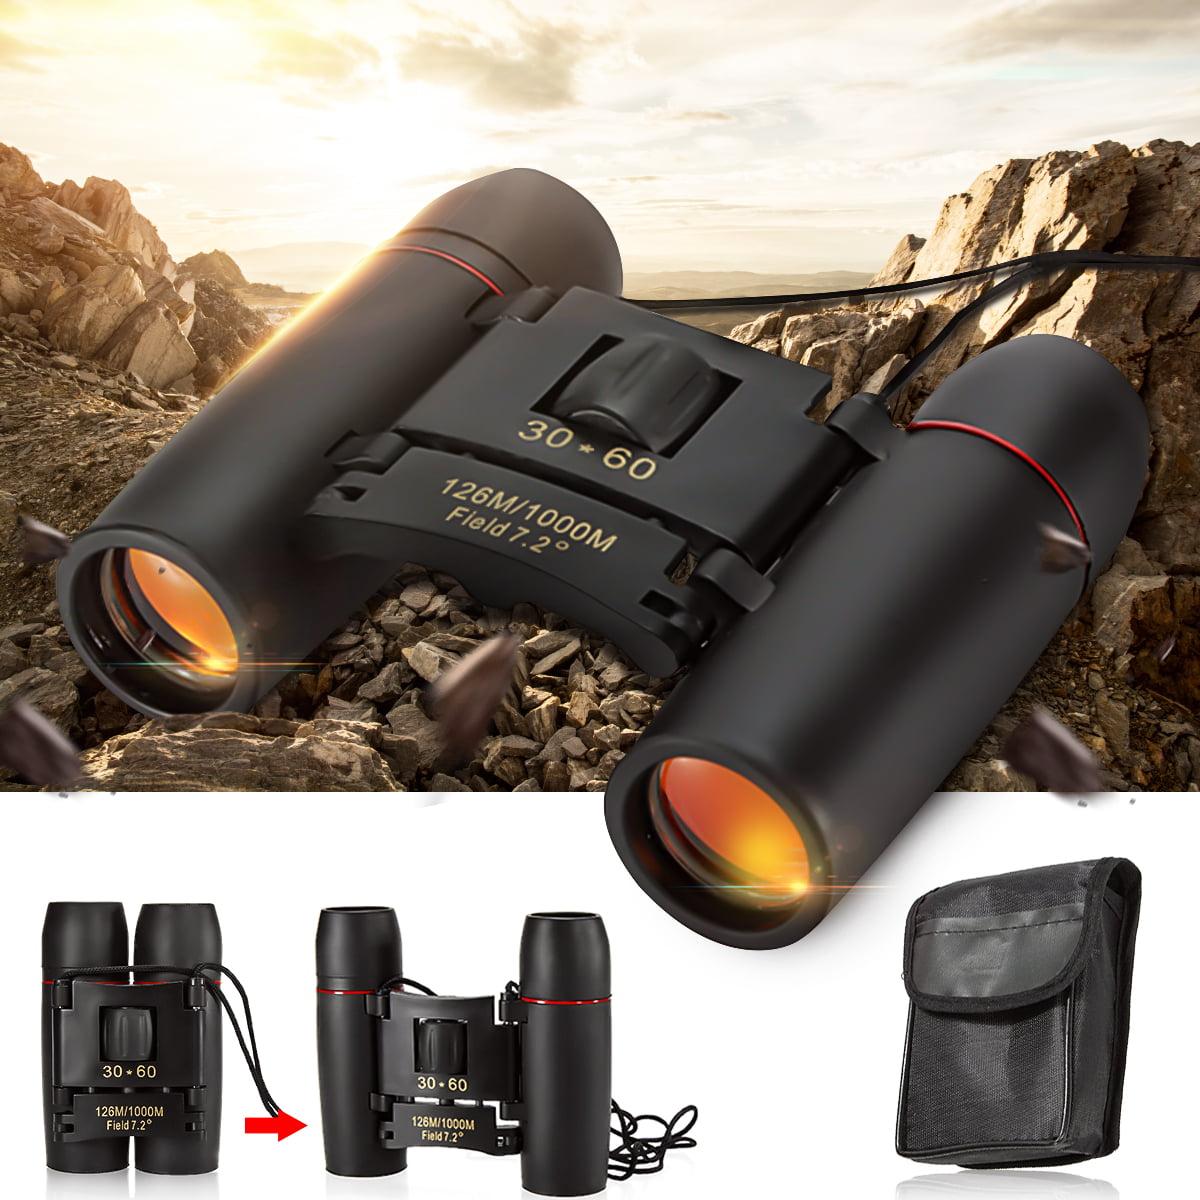 Day And Night Vision 30x60 126m/1000m Folding Binoculars Telescope w/ Strip&Bag For Hunting Camping Hiking Travel Bird Watching